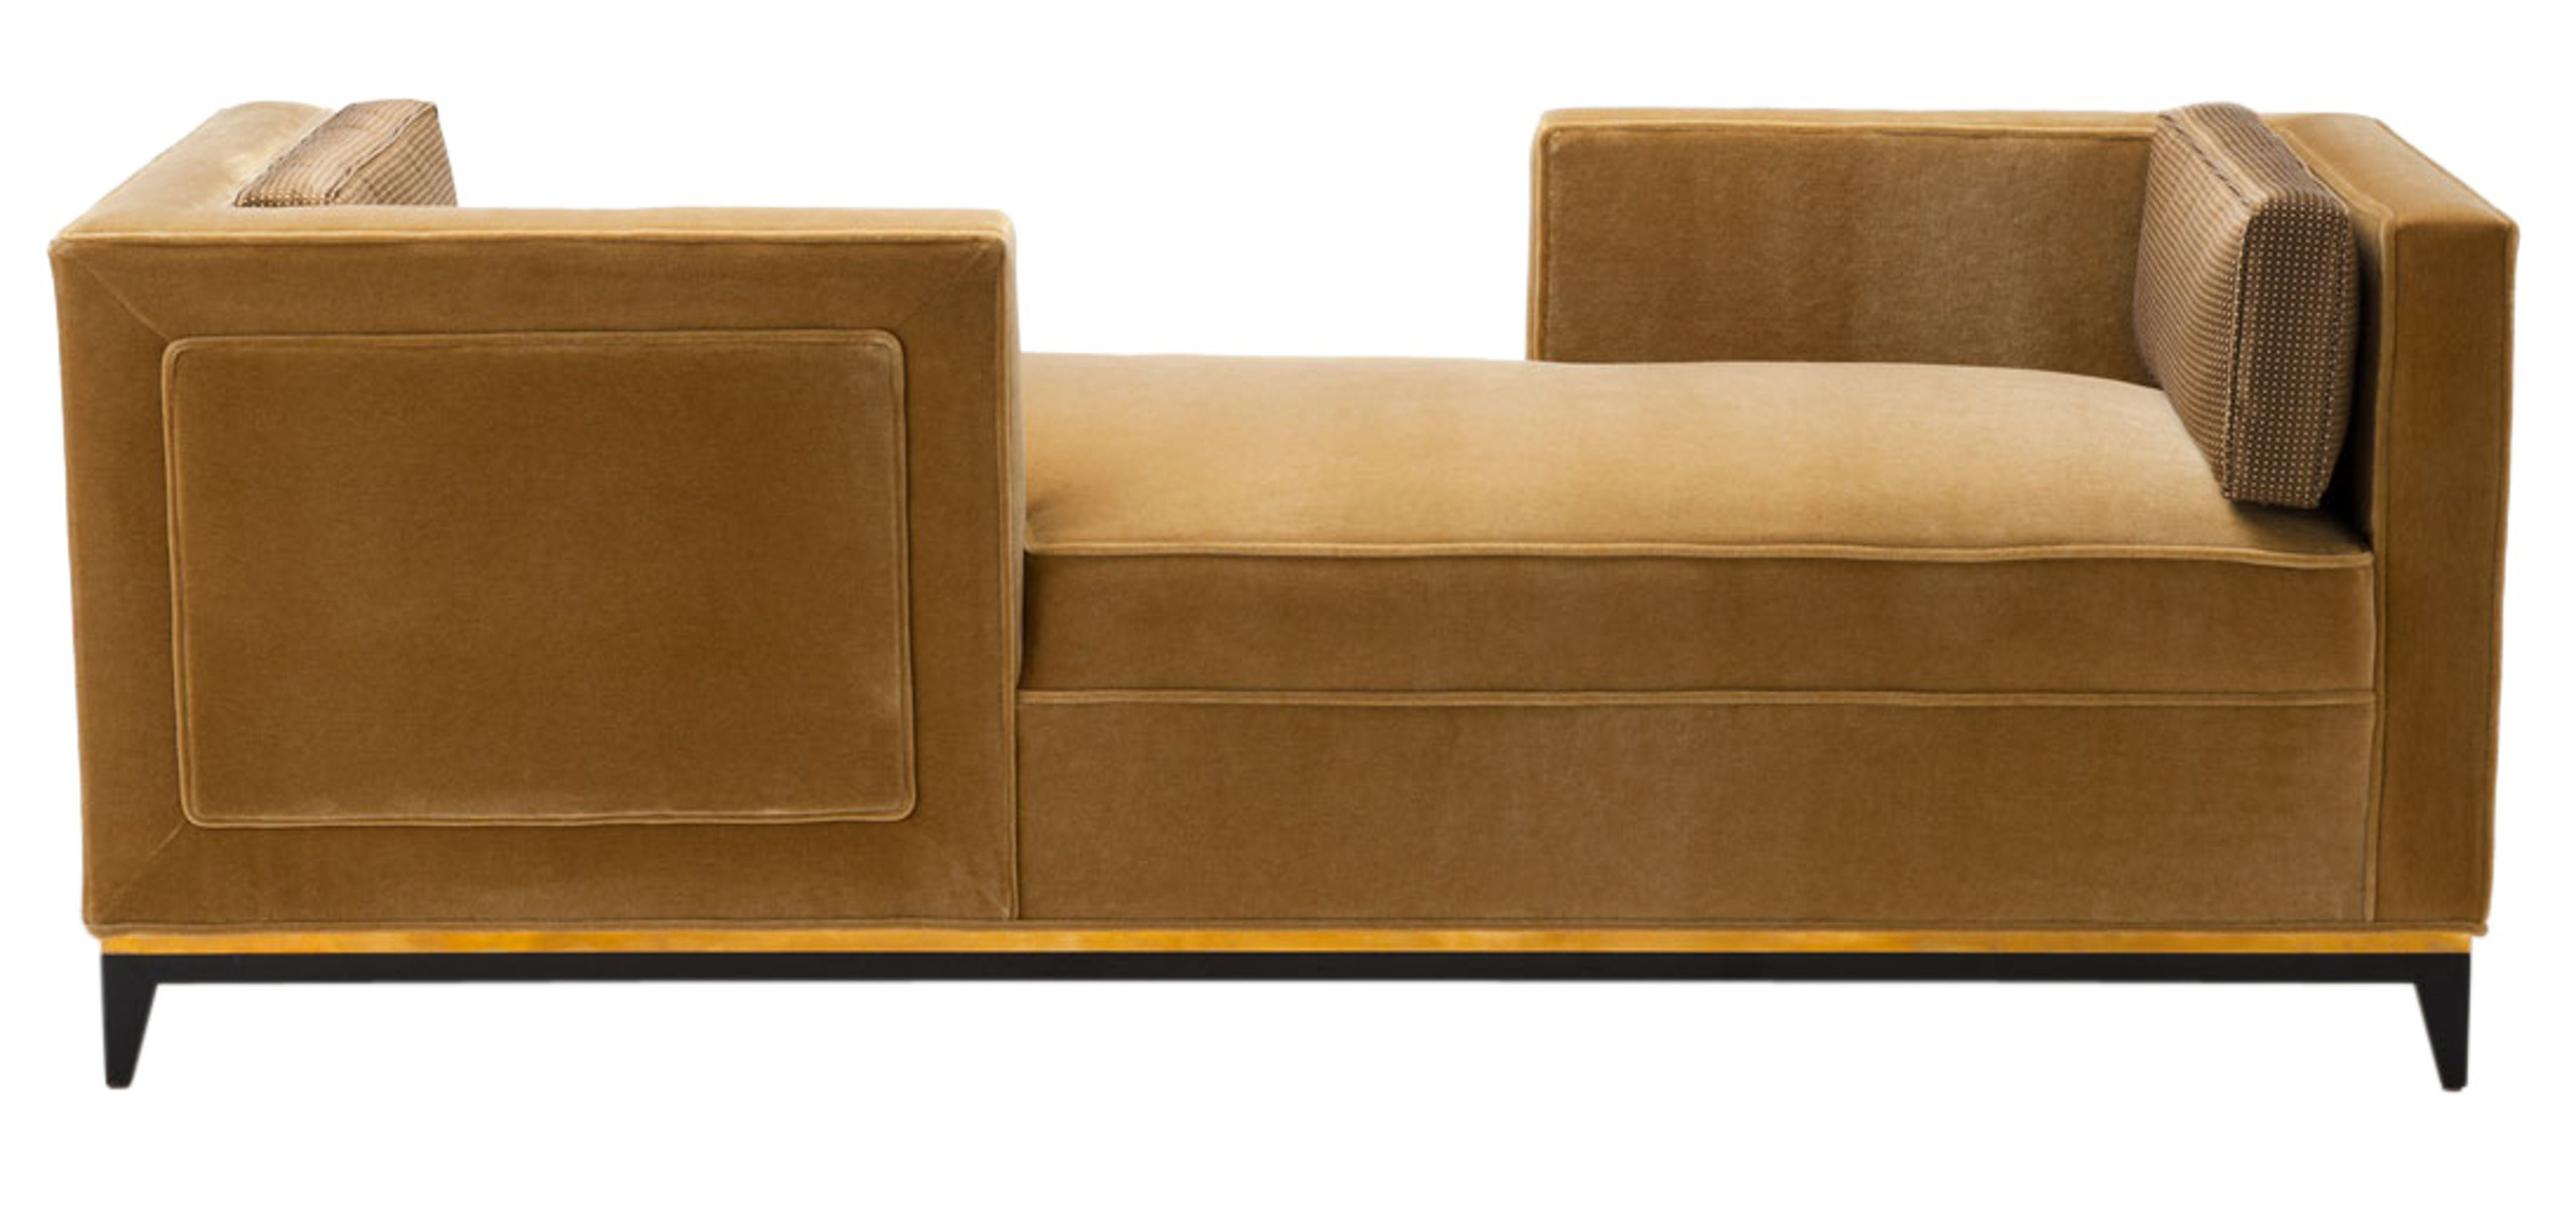 Amy Somerville London Raconteur Sofa Furniture Day Beds Metal Modern